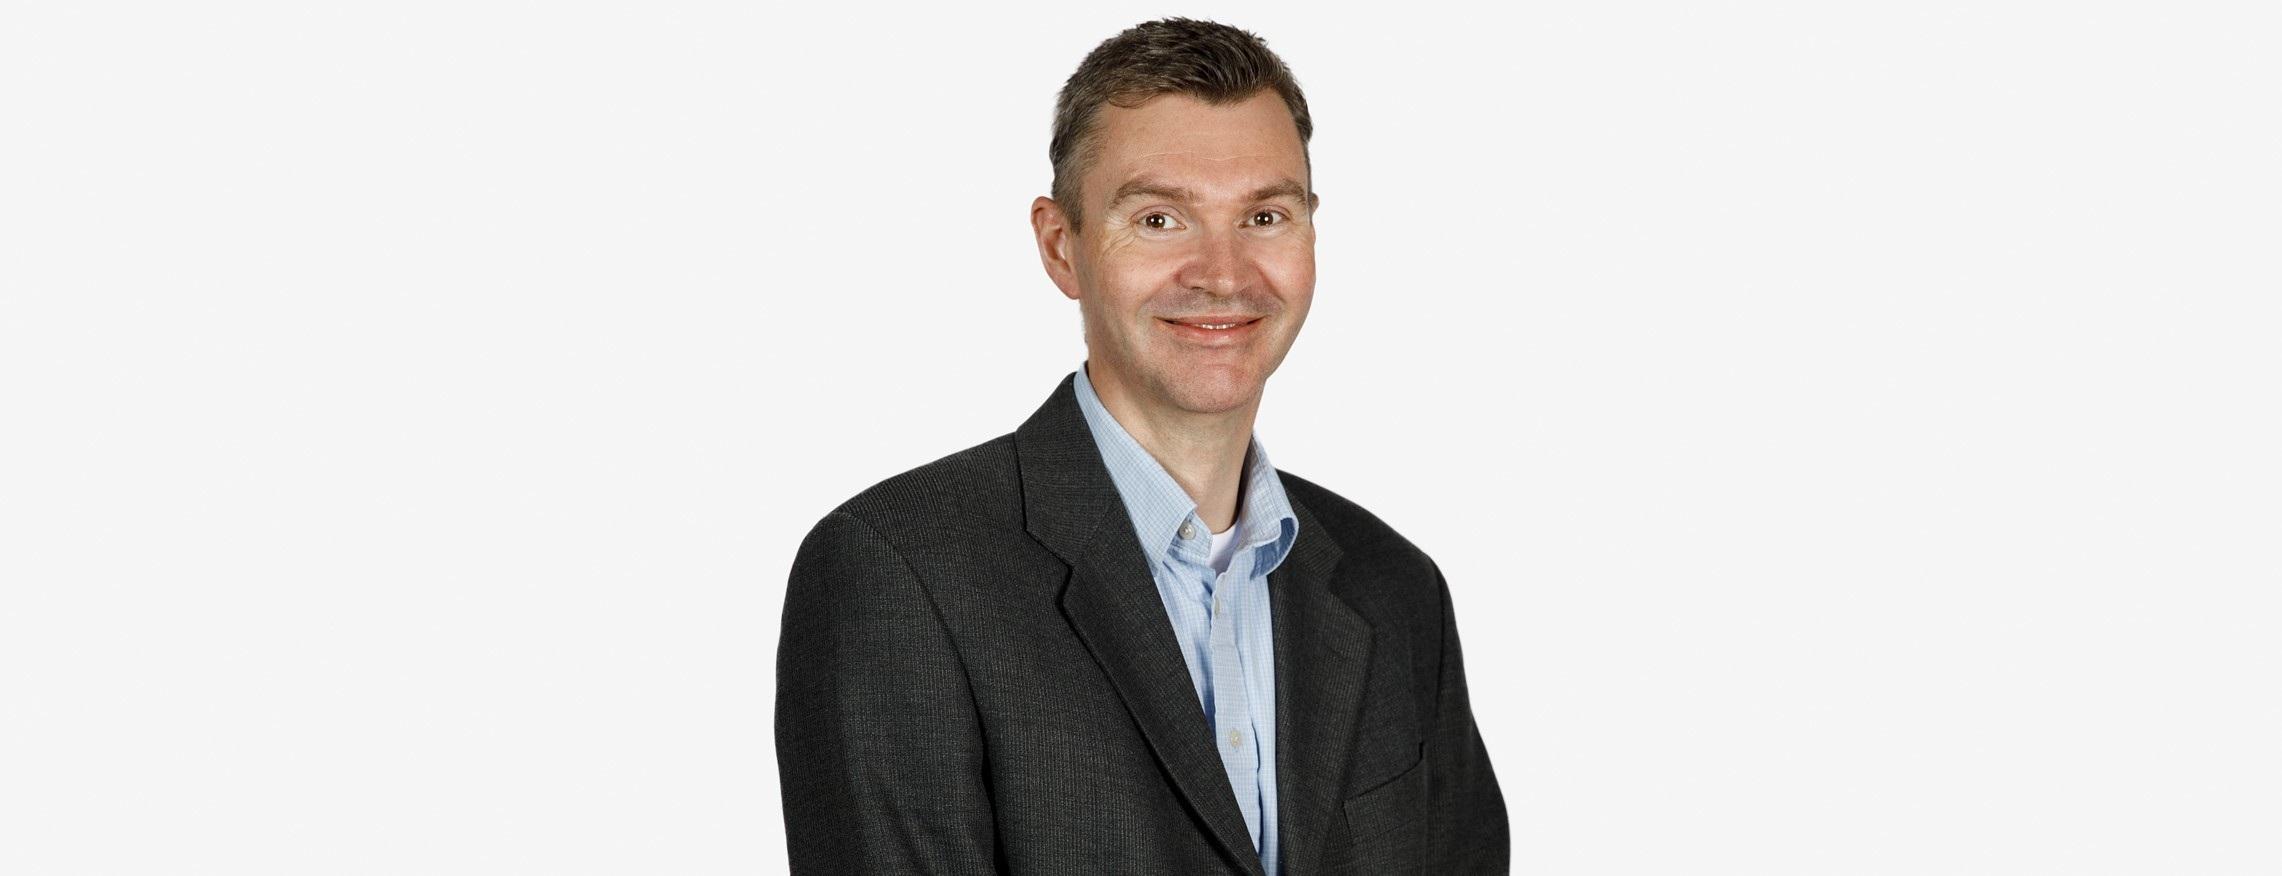 Henrik Ohrn